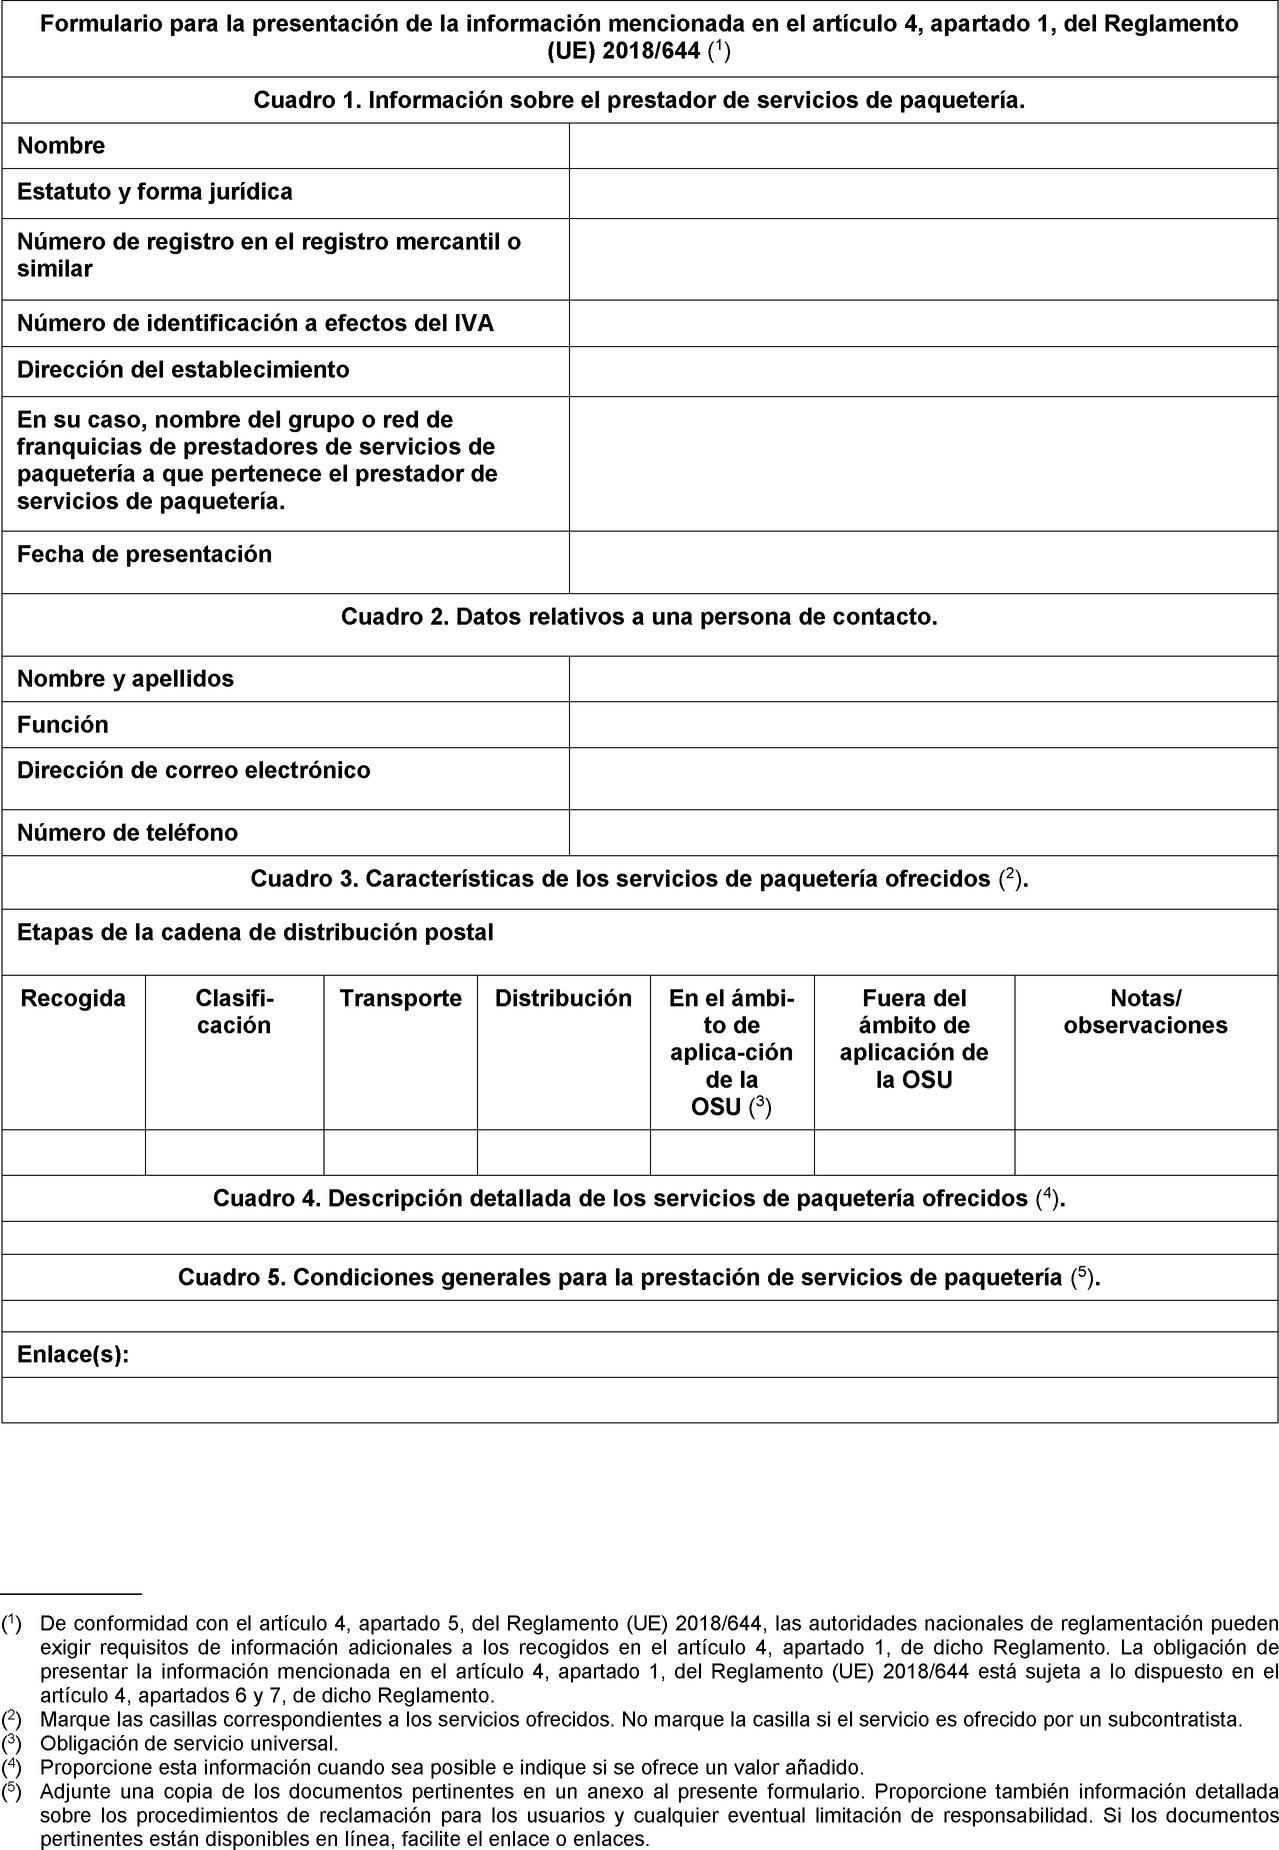 Imagen: https://eur-lex.europa.eu/resource.html?uri=uriserv:OJ.L_.2018.238.01.0065.01.SPA.xhtml.L_2018238ES.01006702.tif.jpg